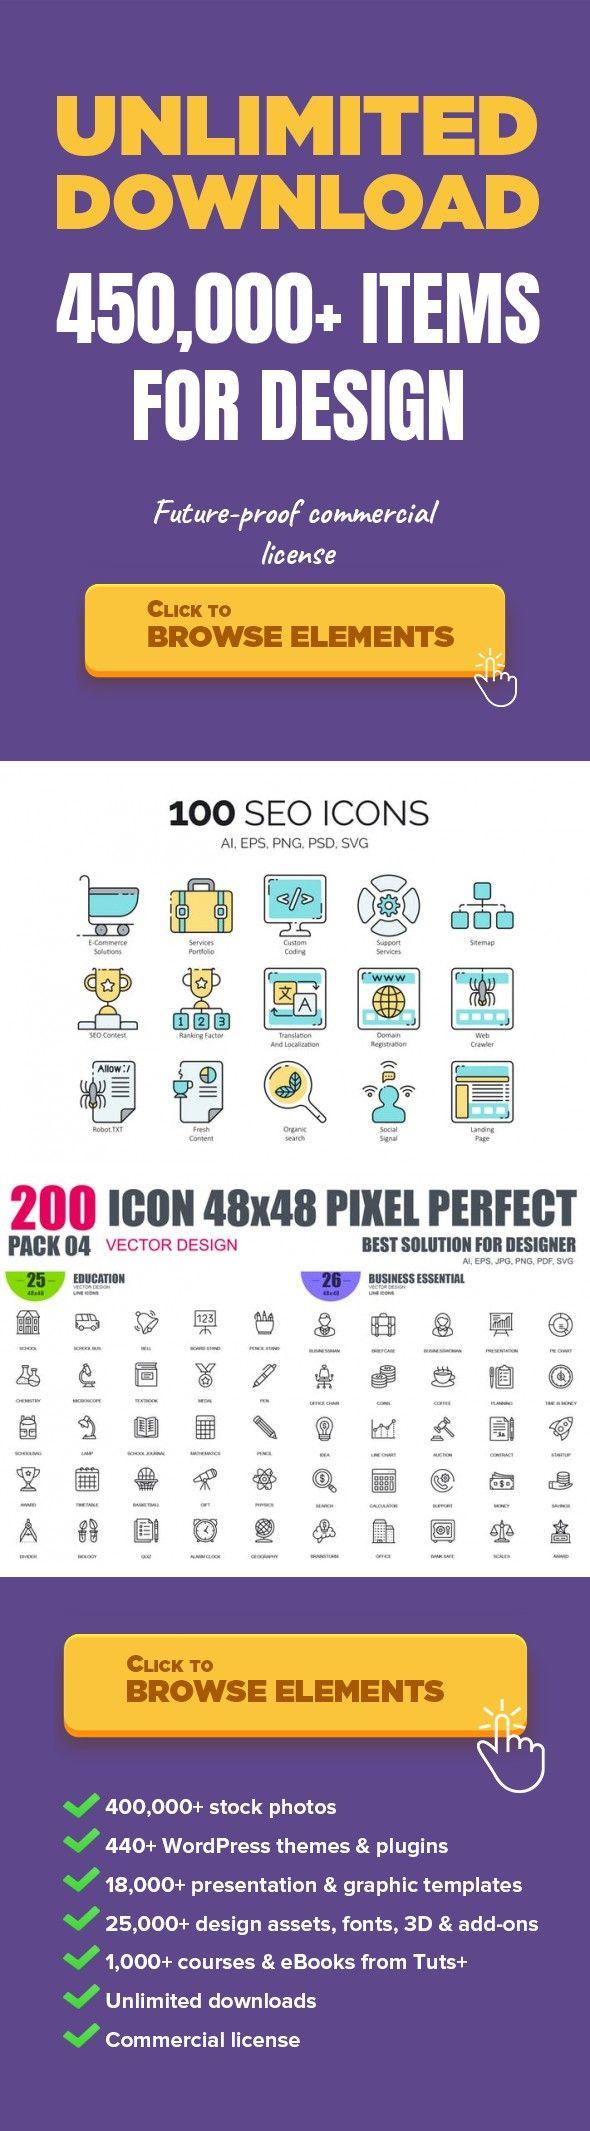 100 Seo Internet Marketing Icons Graphics Icons Vectors Seo Icon Icons Set Business Optimization Search Internet Marketing Find Icons Marketing Icon